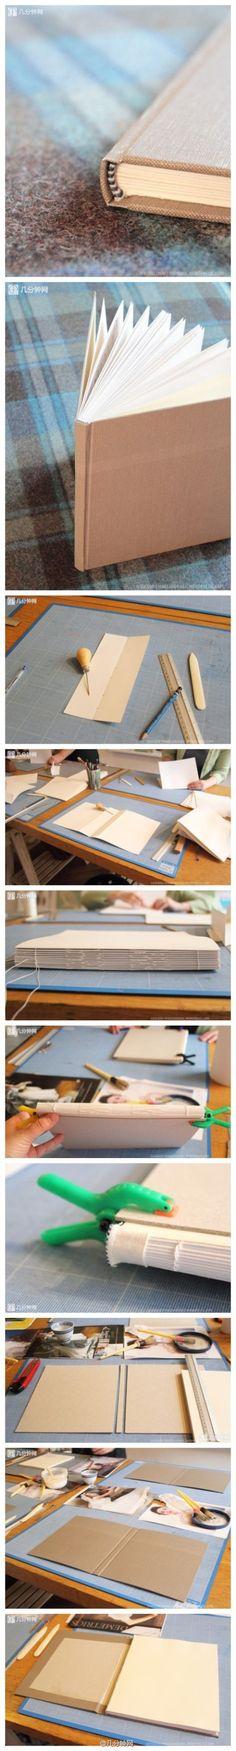 Tutoría de encuadernación   -   Bookbinding tutorial